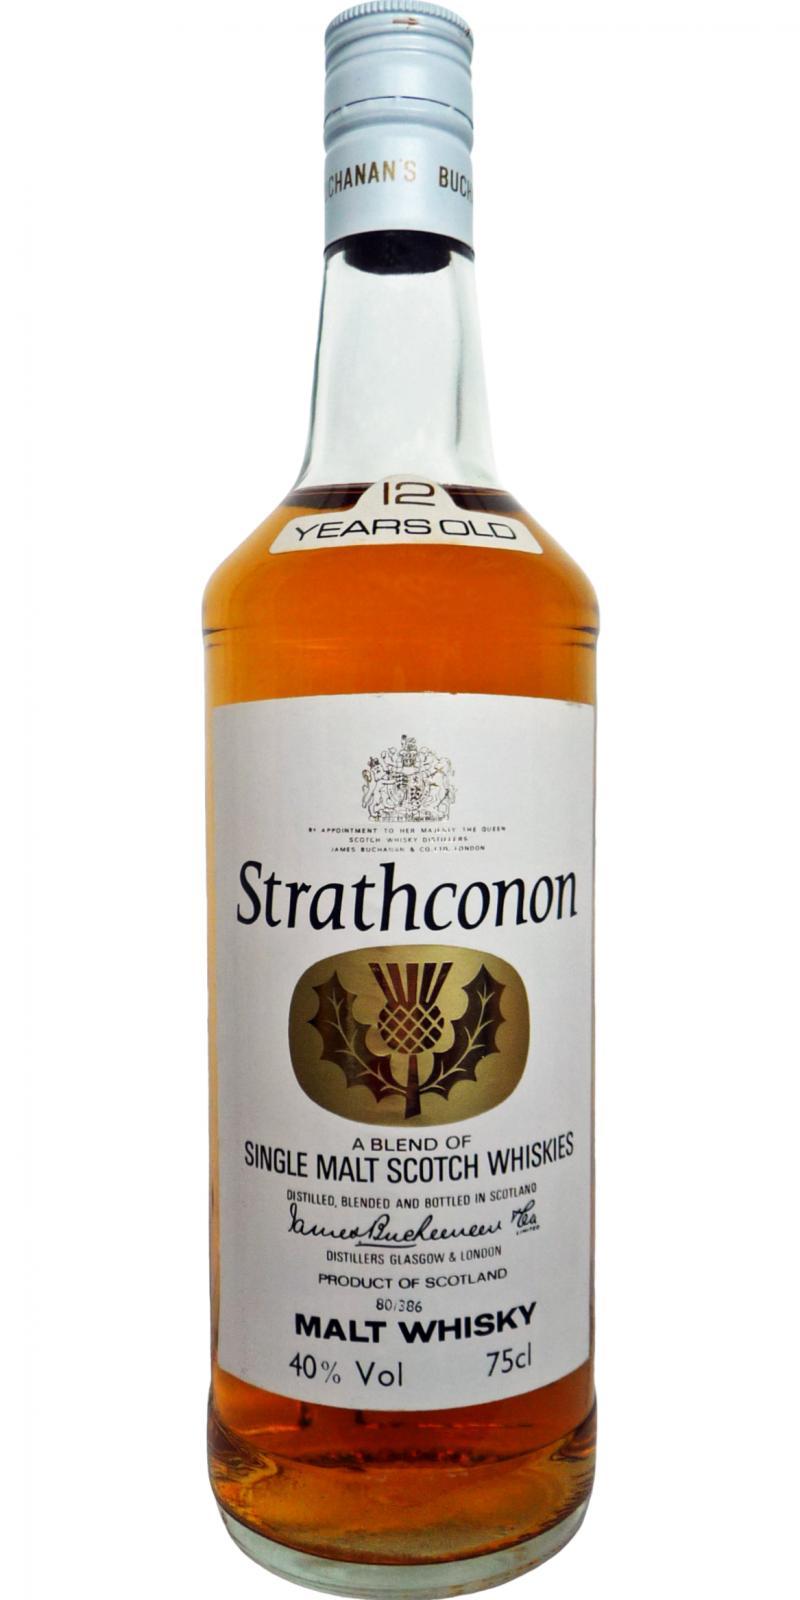 Strathconon 12-year-old